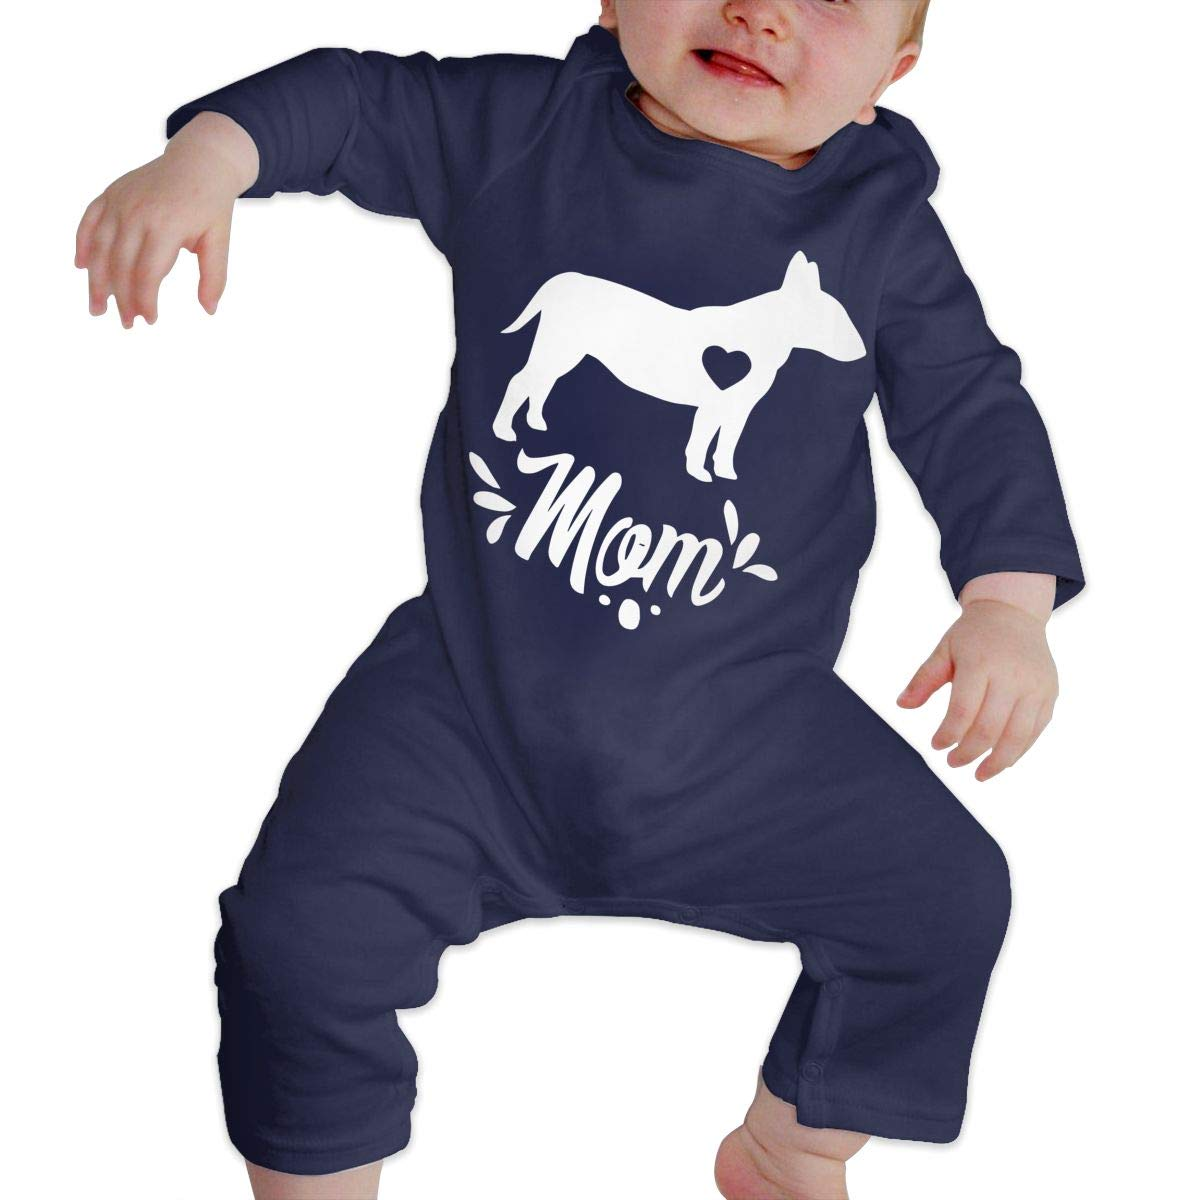 LBJQ8 Bull Terrier Dog Mom Newborn Baby Girl Infant Sleep and Play Bodysuits Coverall Jumpsuit